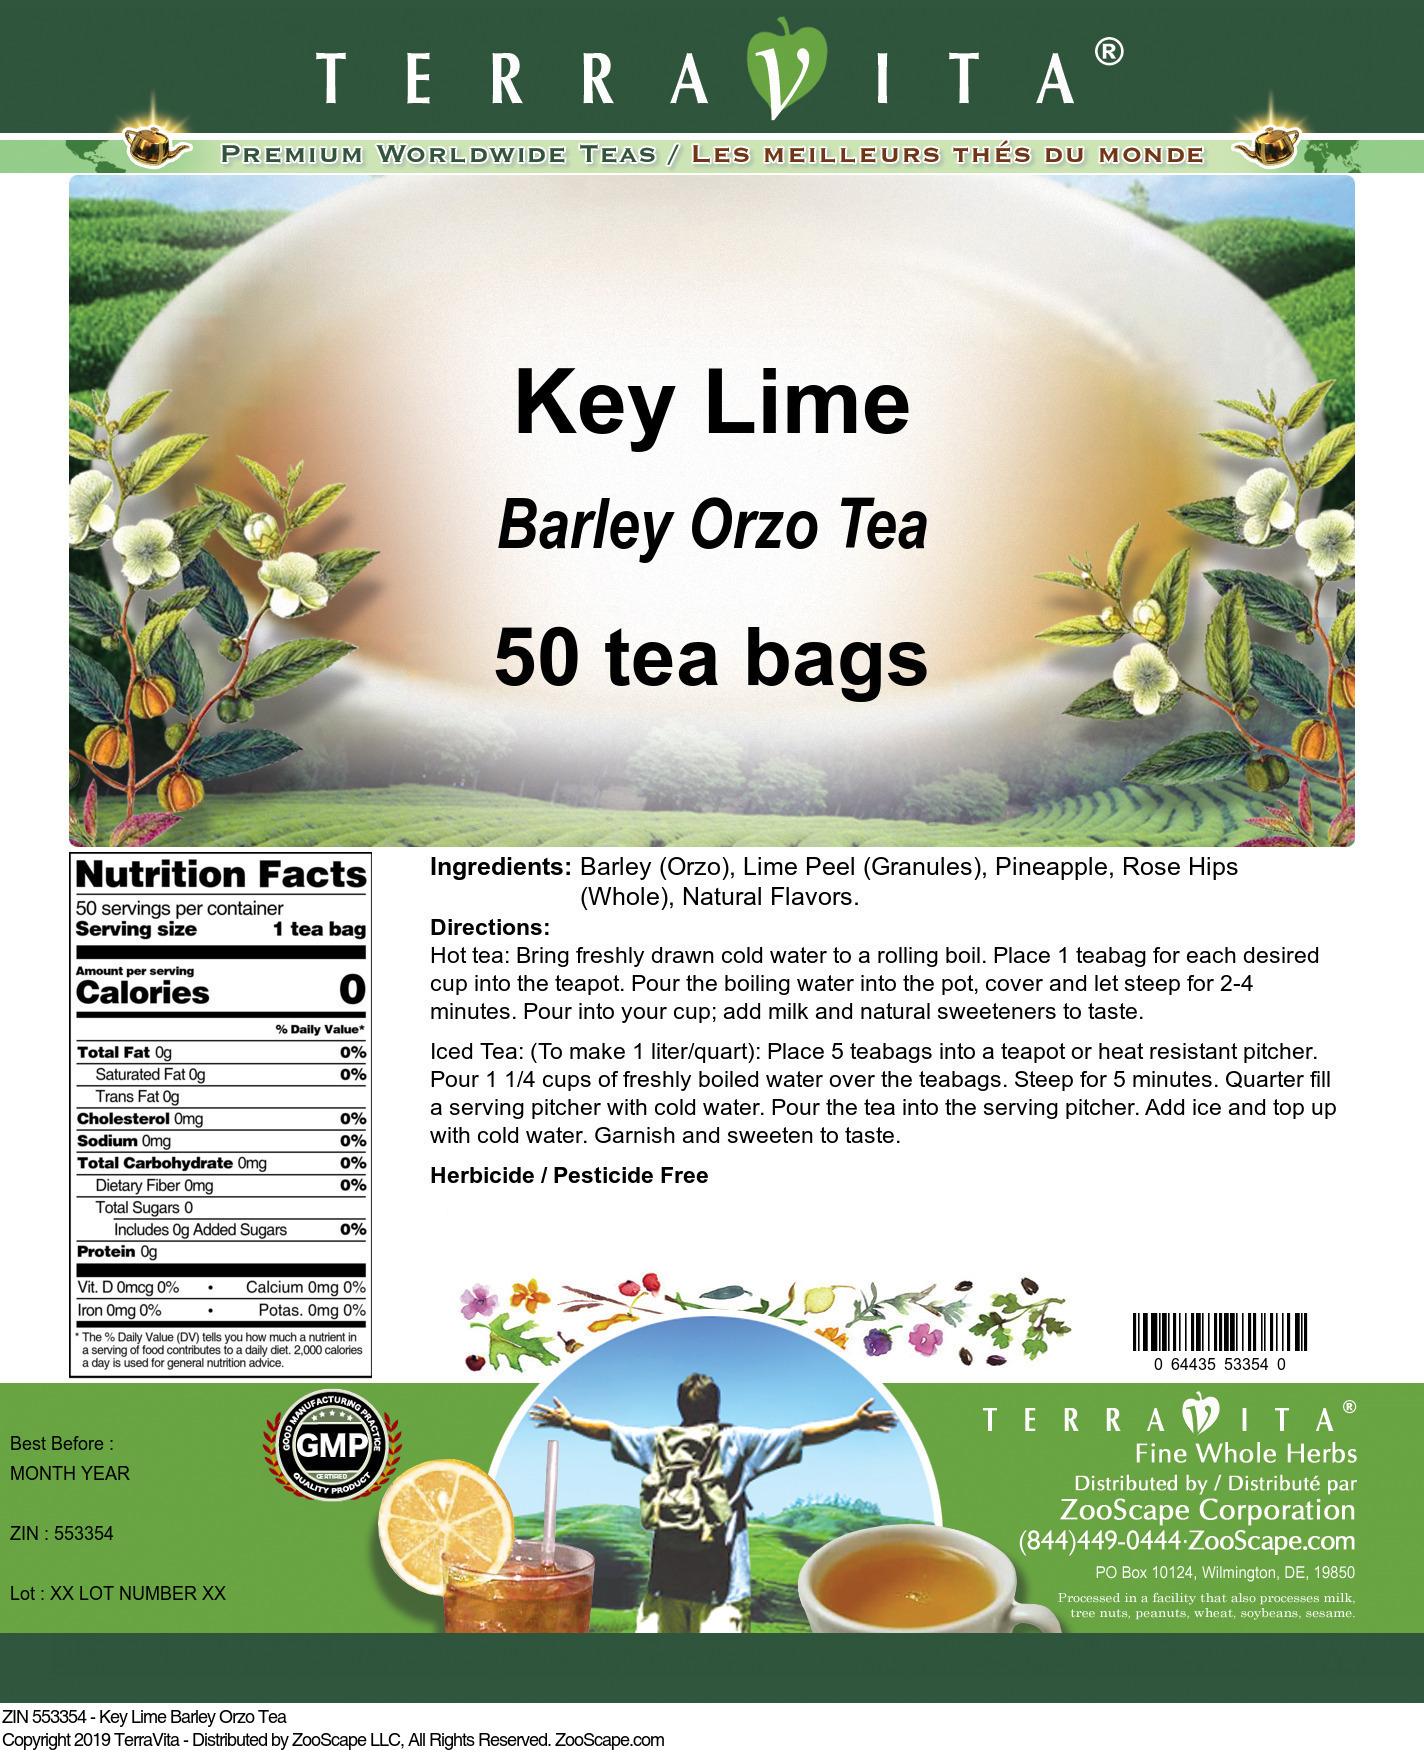 Key Lime Barley Orzo Tea